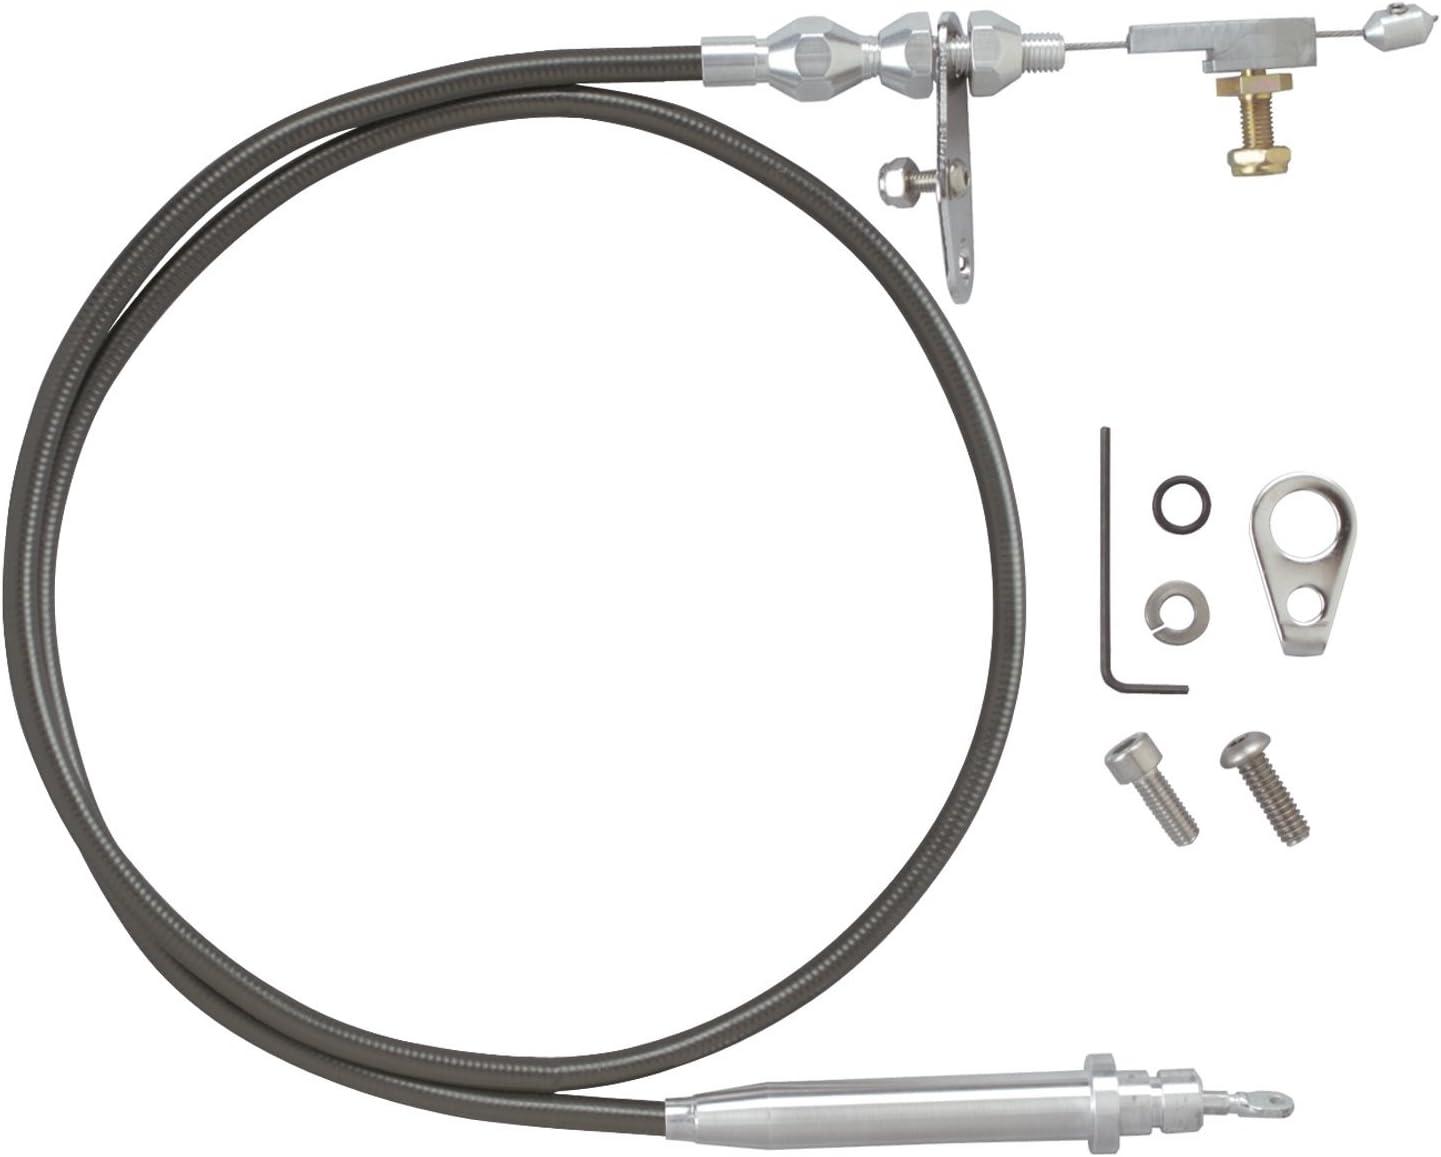 Lokar KD-2AODU Black Kickdown Cable Kit for Ford AOD Transmission